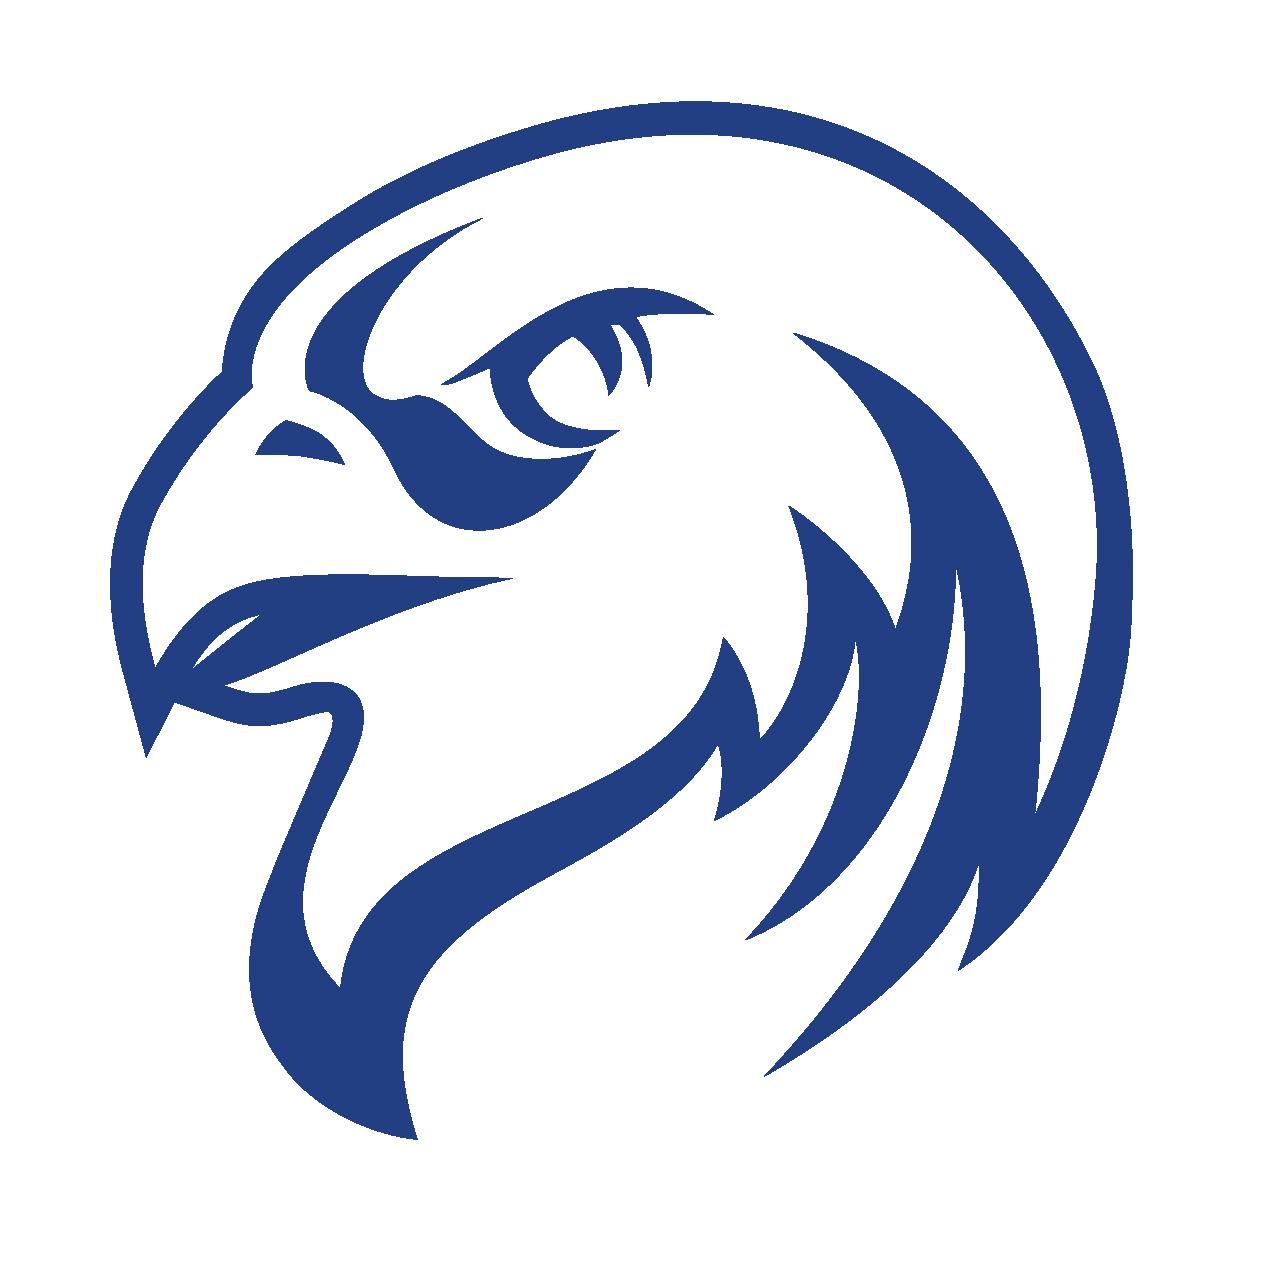 Atlanta falcons png free. Falcon clipart logo